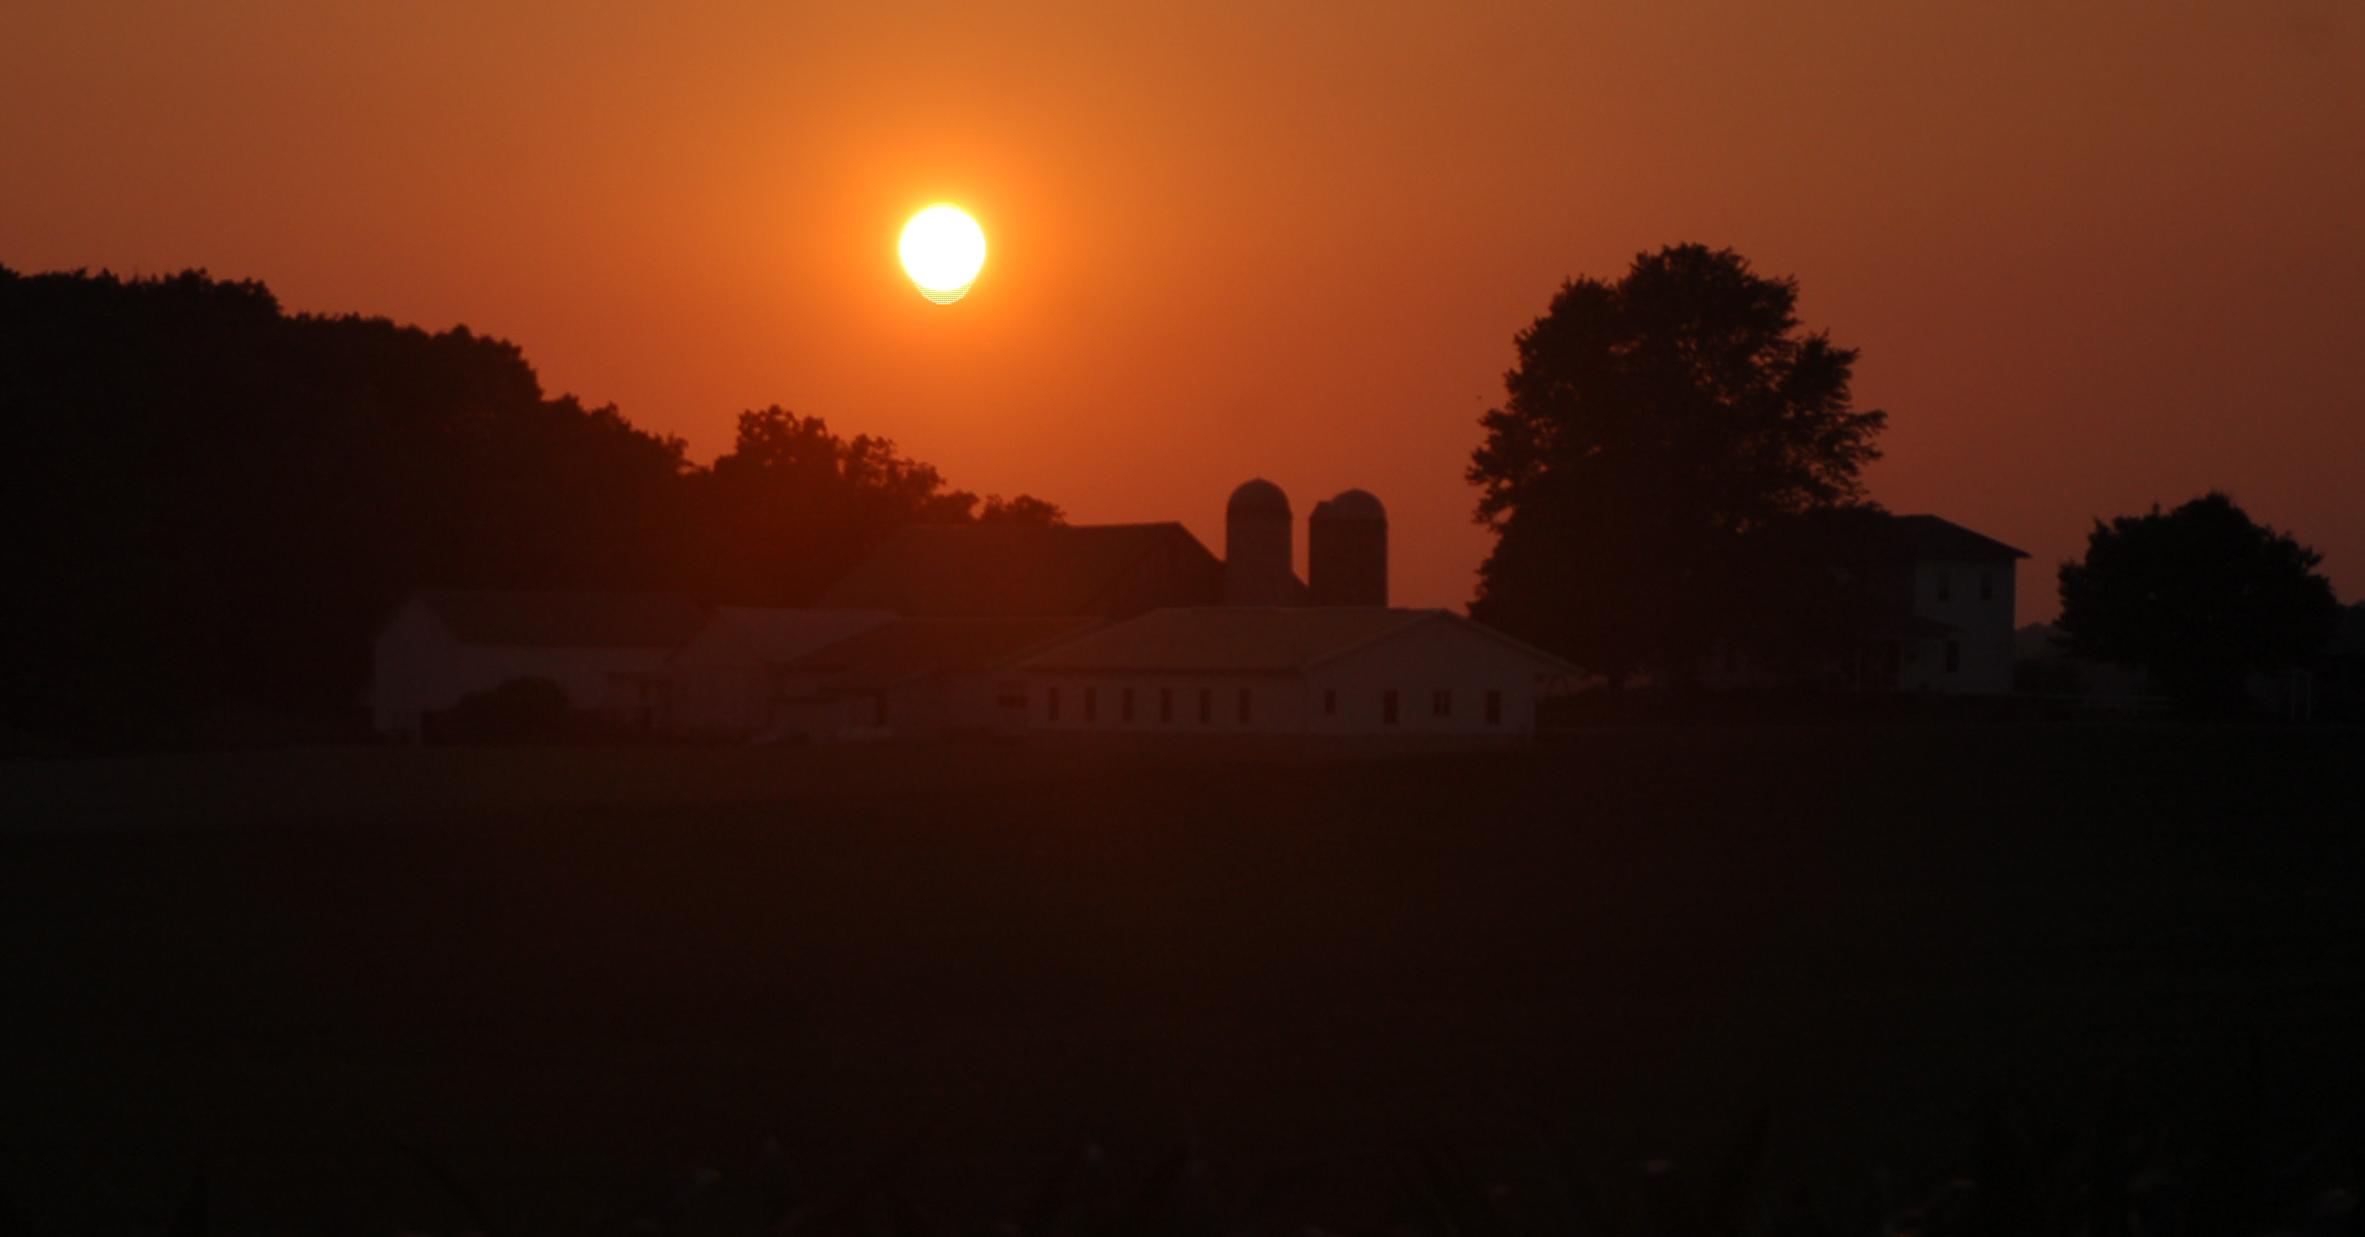 Farm sunset by Bruce Stambaugh